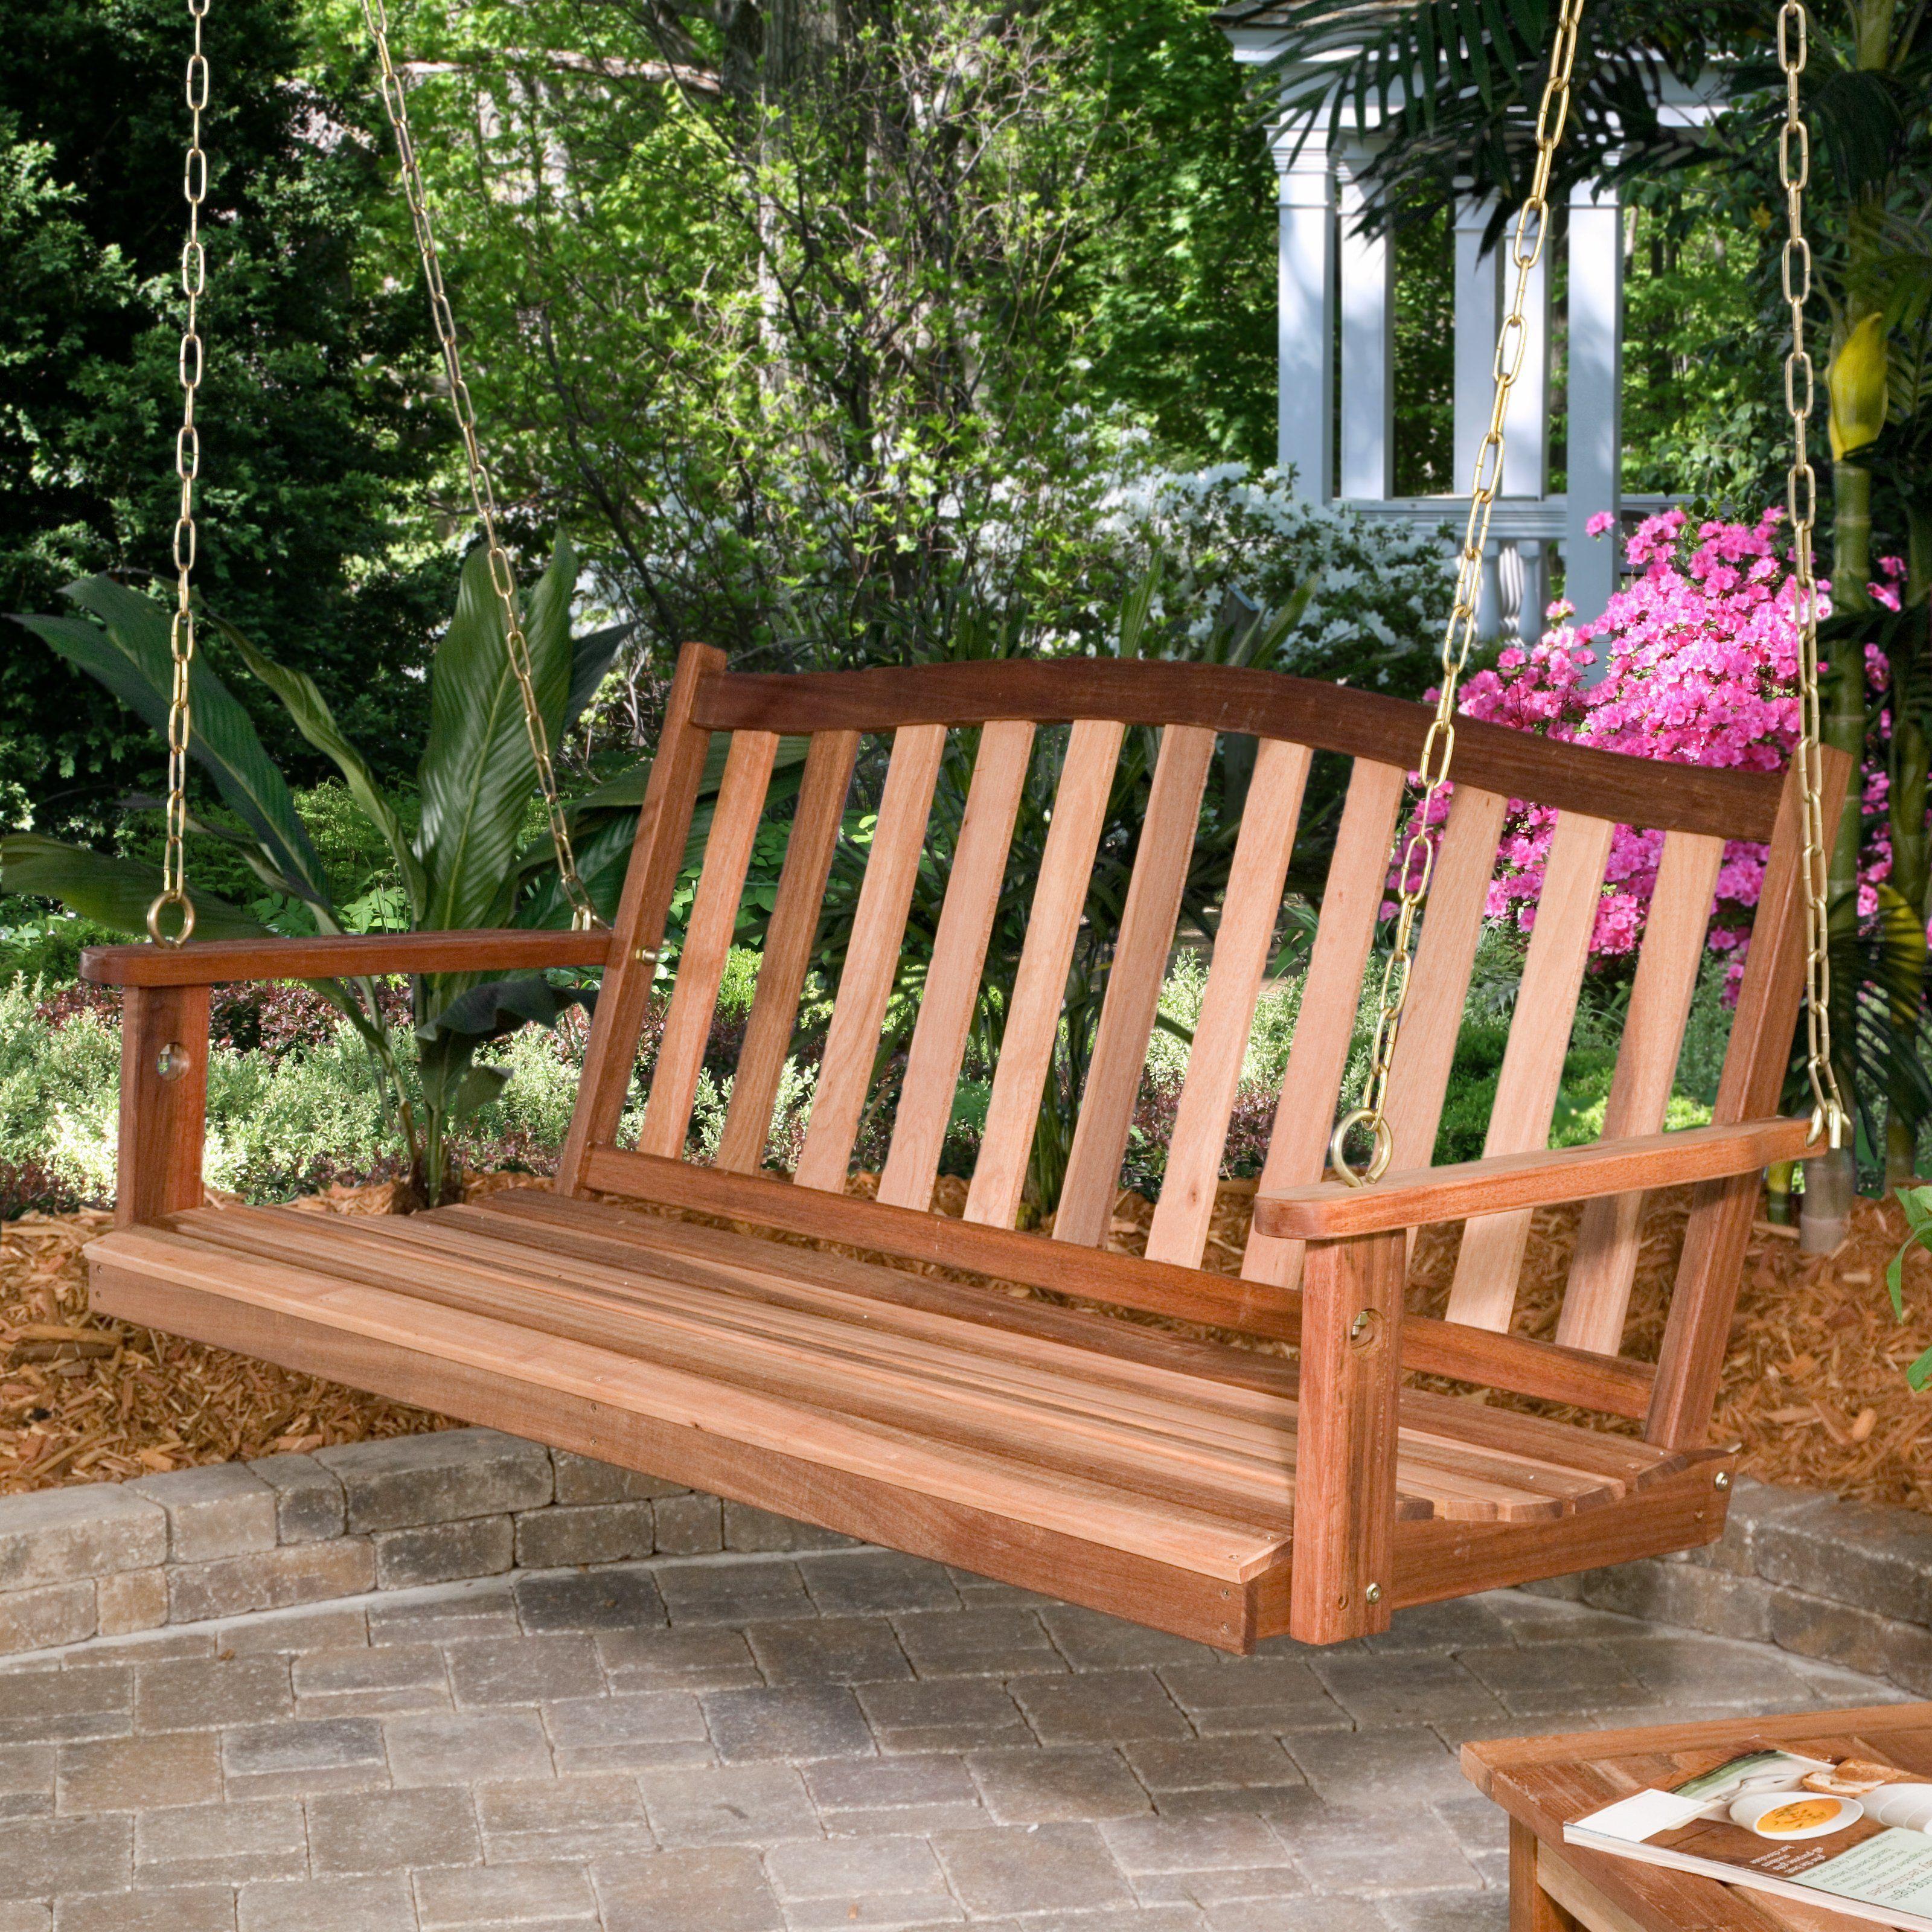 Pin by Kortney Roberts on Backyardd | Porch swing, Modern ... on Belham Living Richmond Bench id=55666